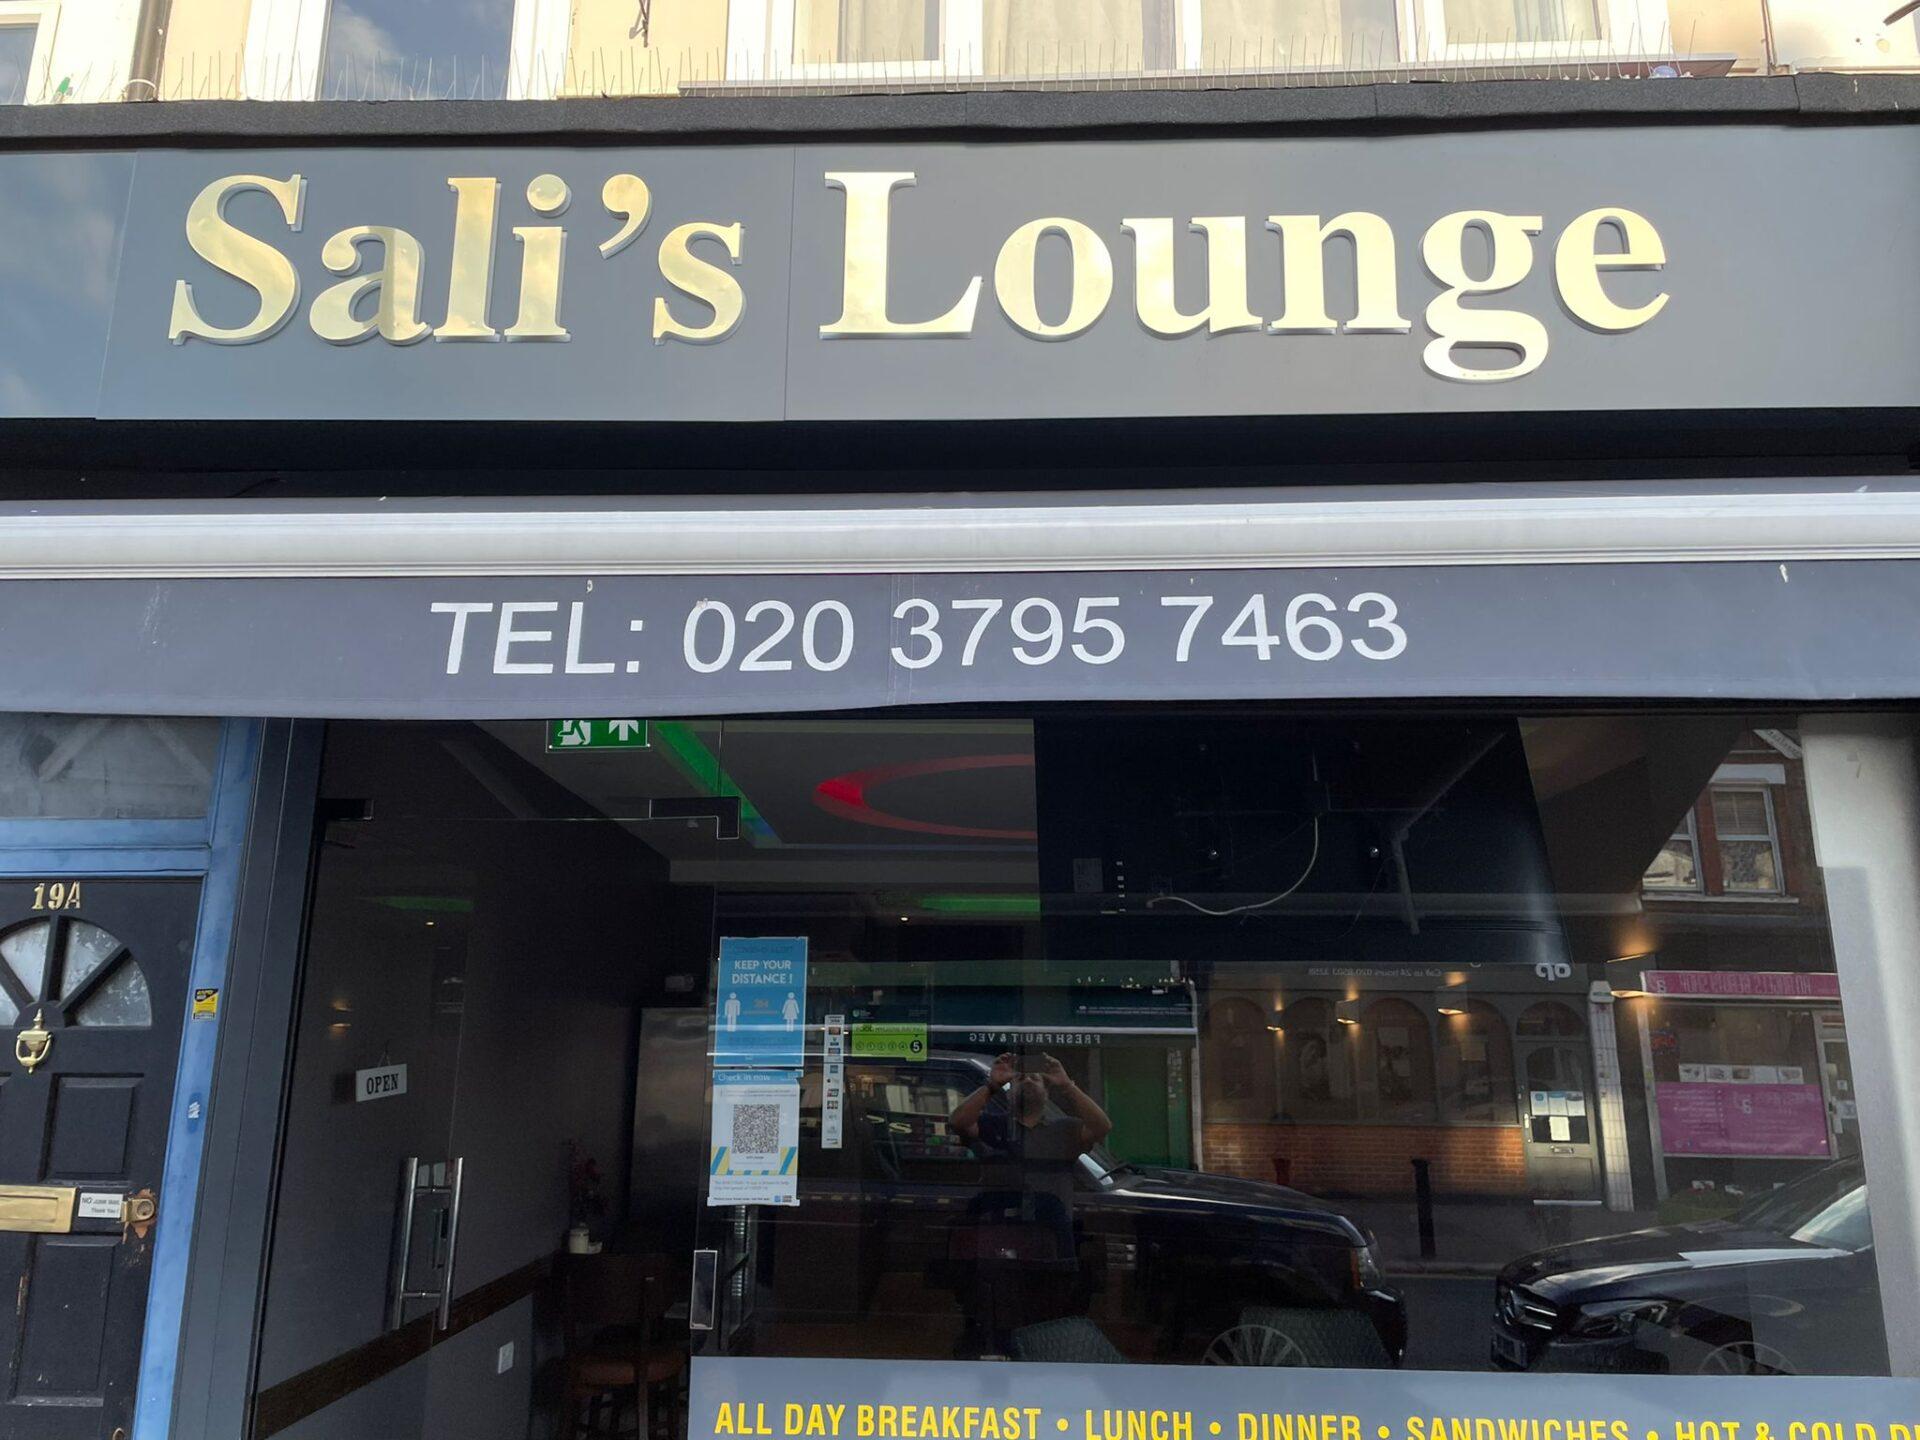 Sali's Lounge - London 7